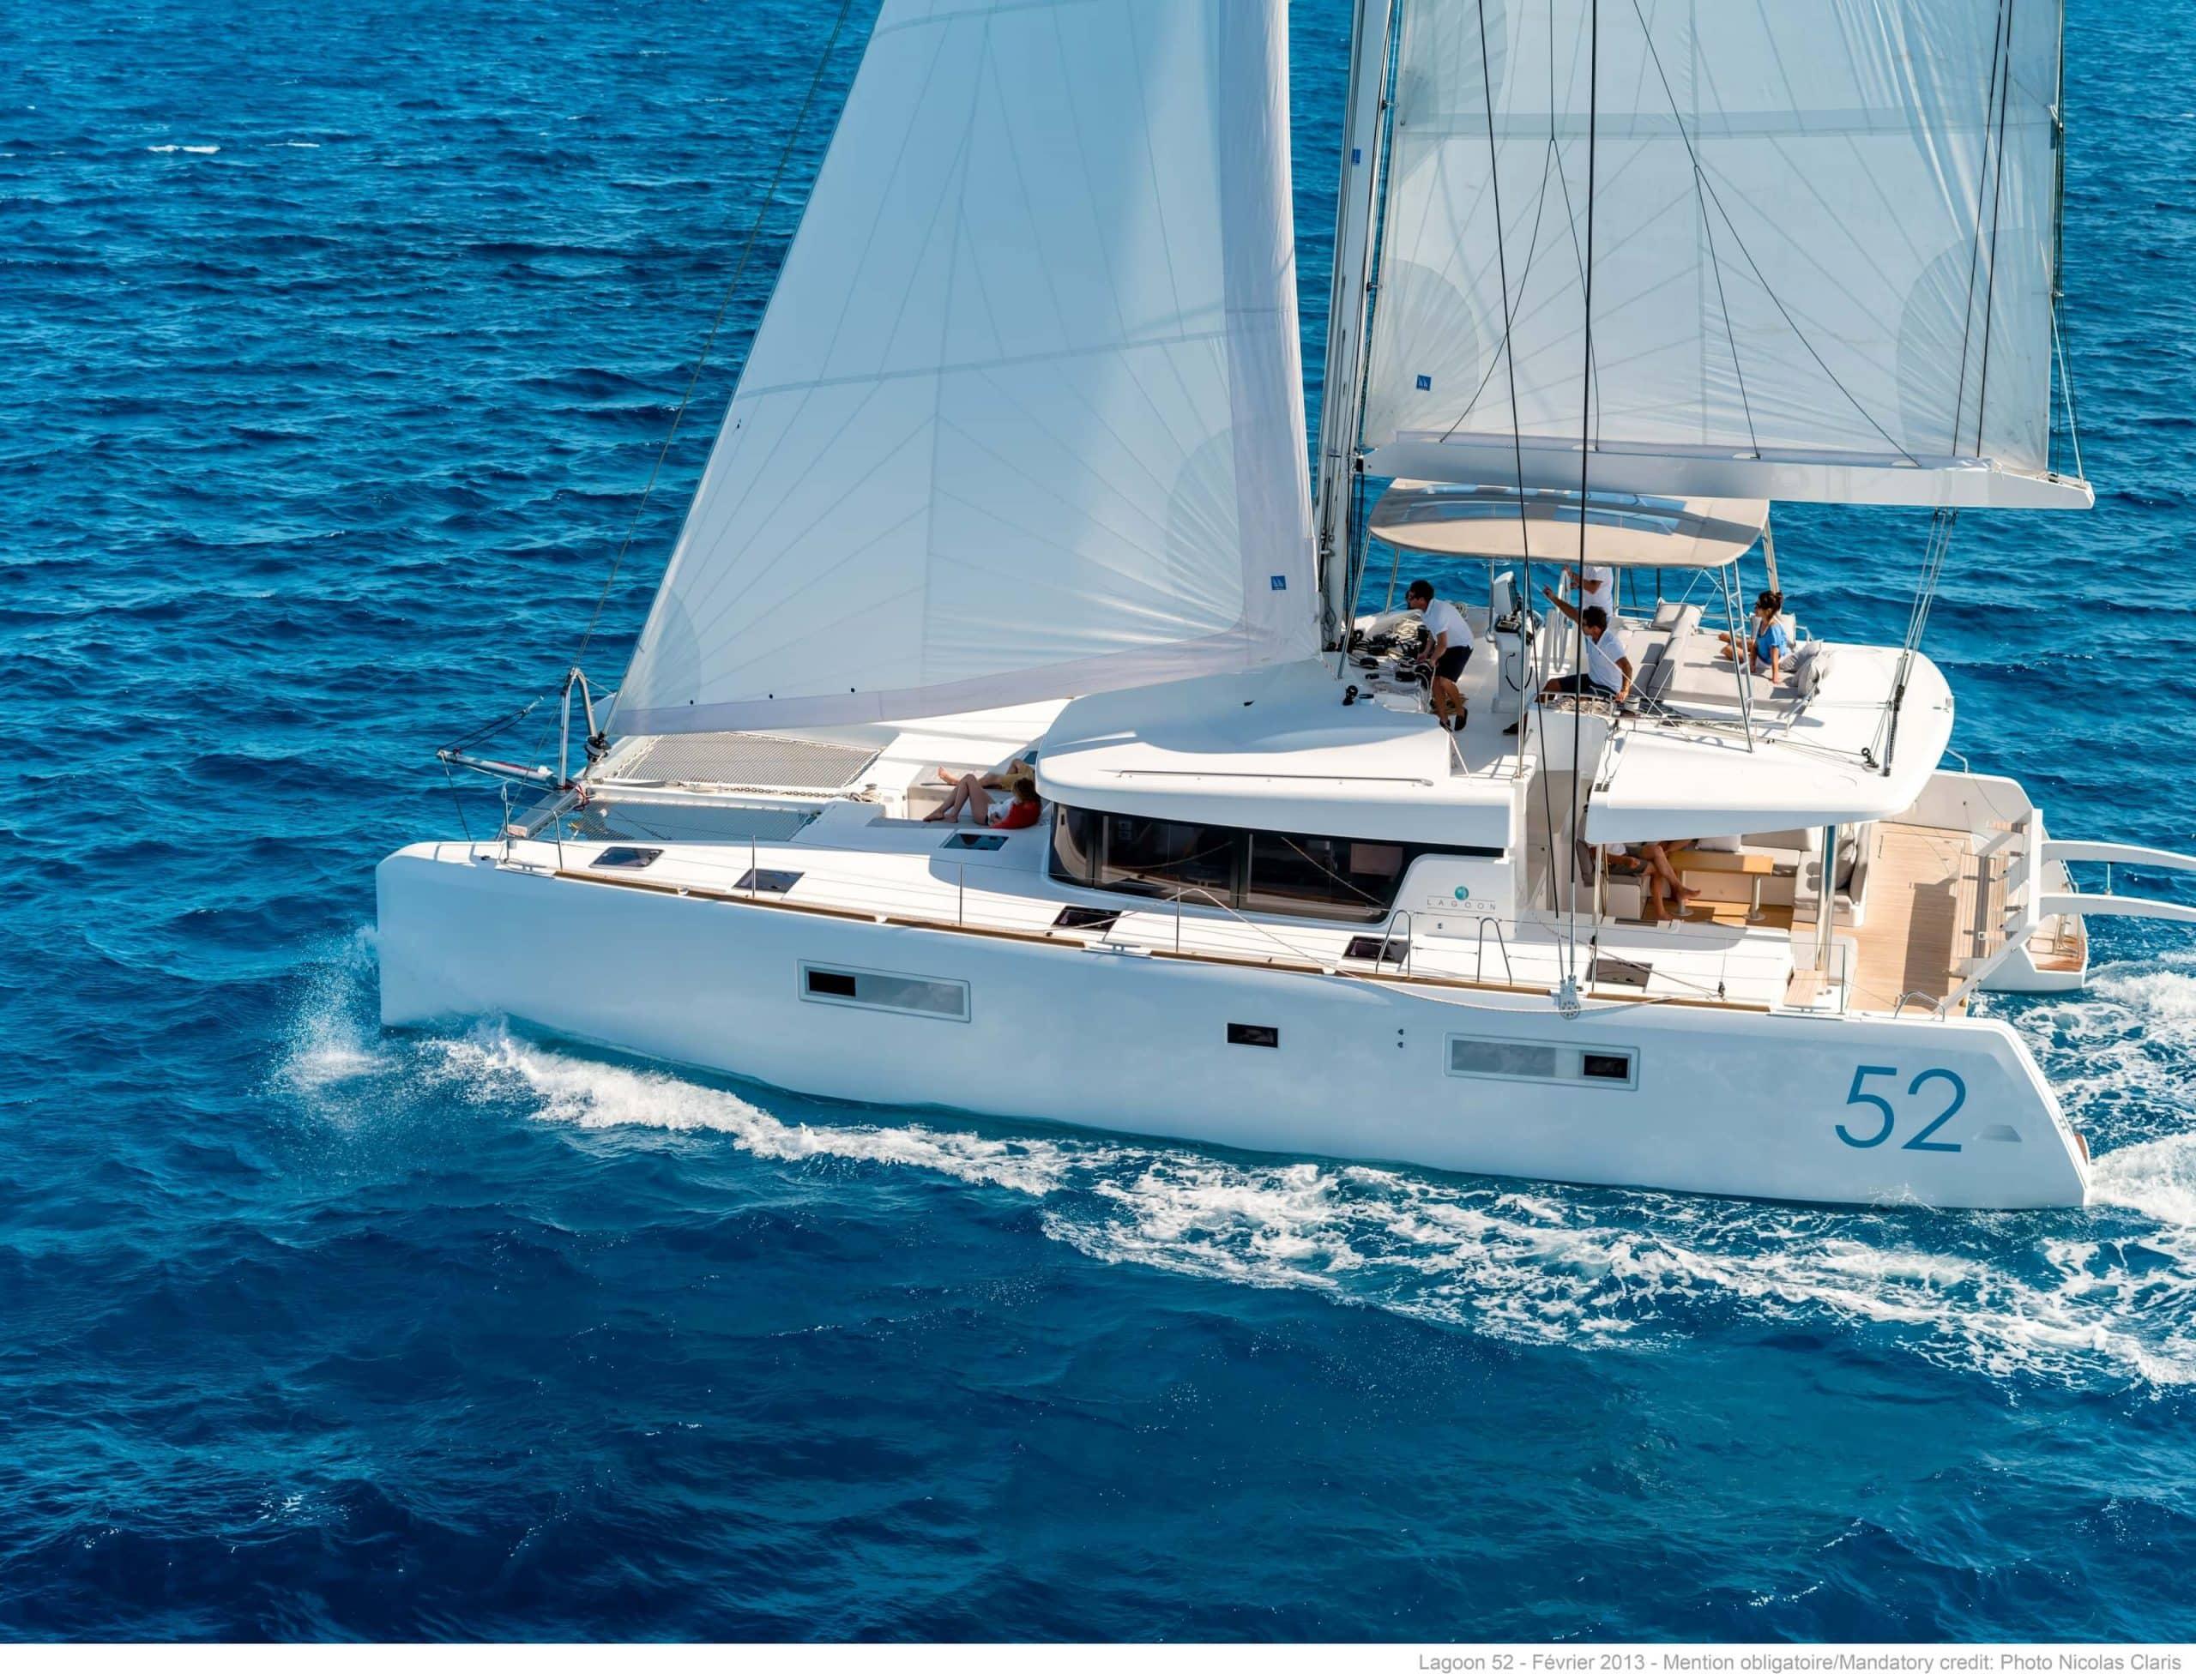 Yacht Charter investor, Lagoon 52